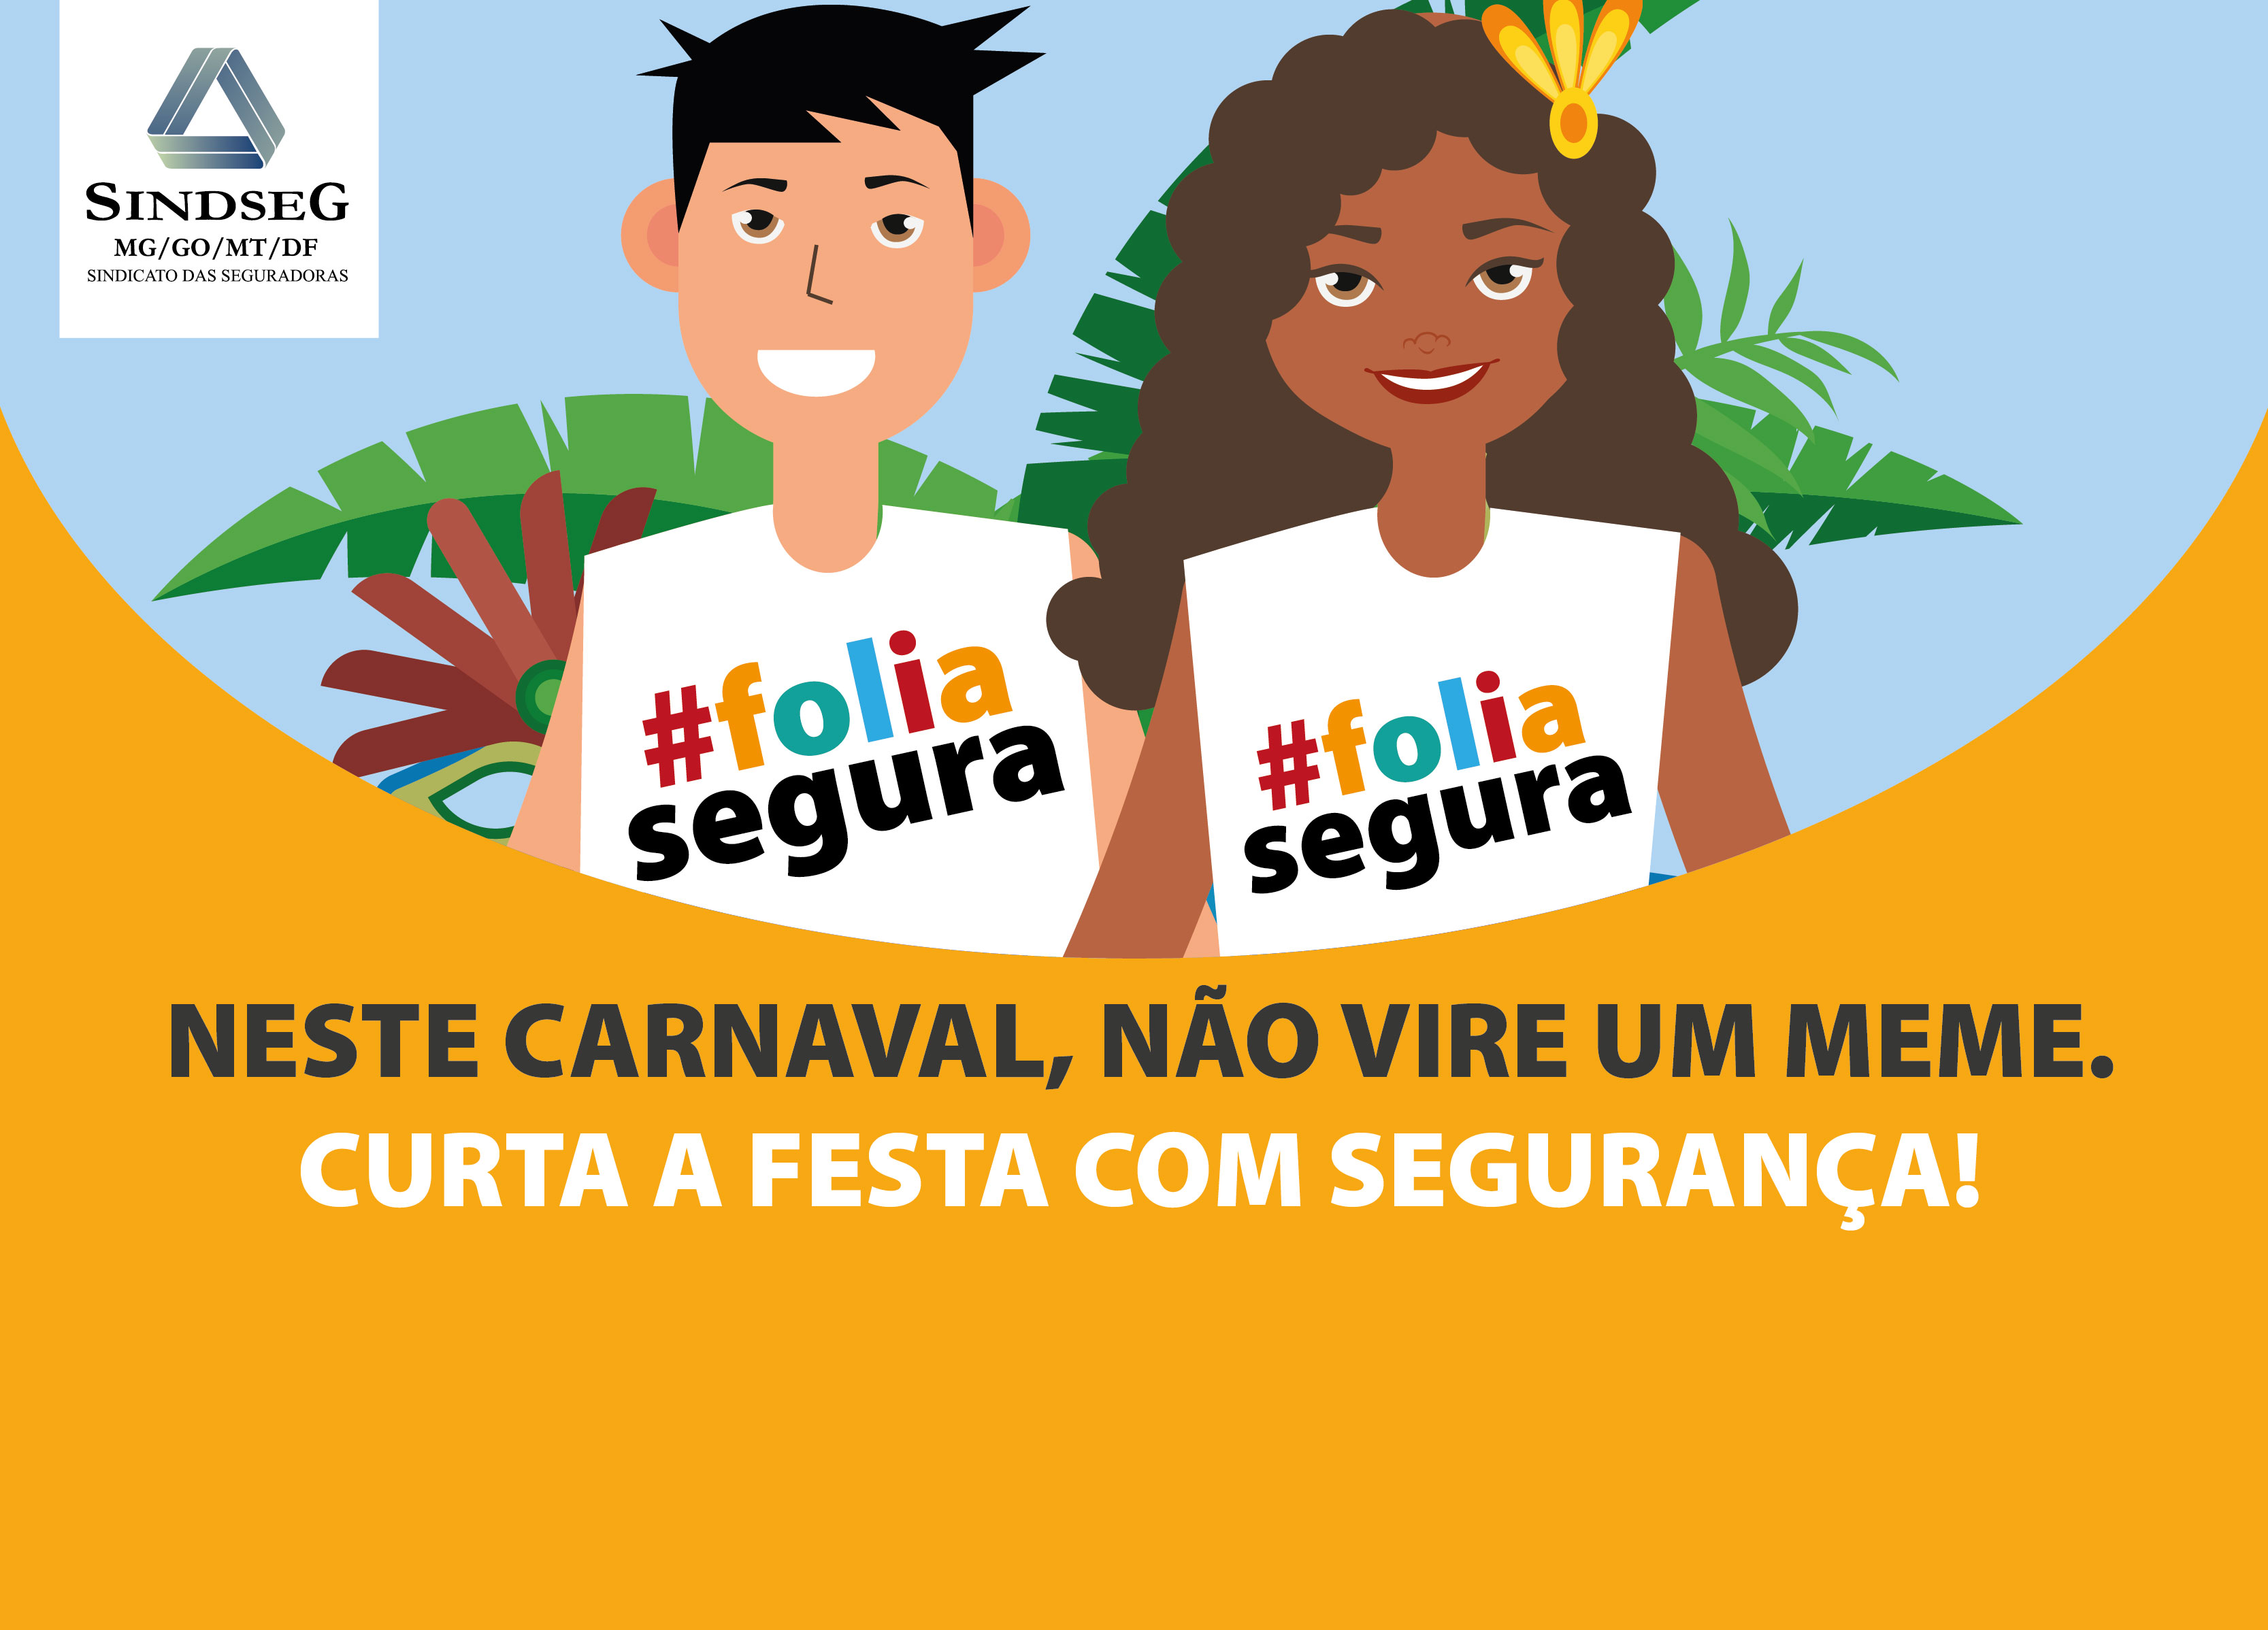 Carnaval_SindSeg_imagem site